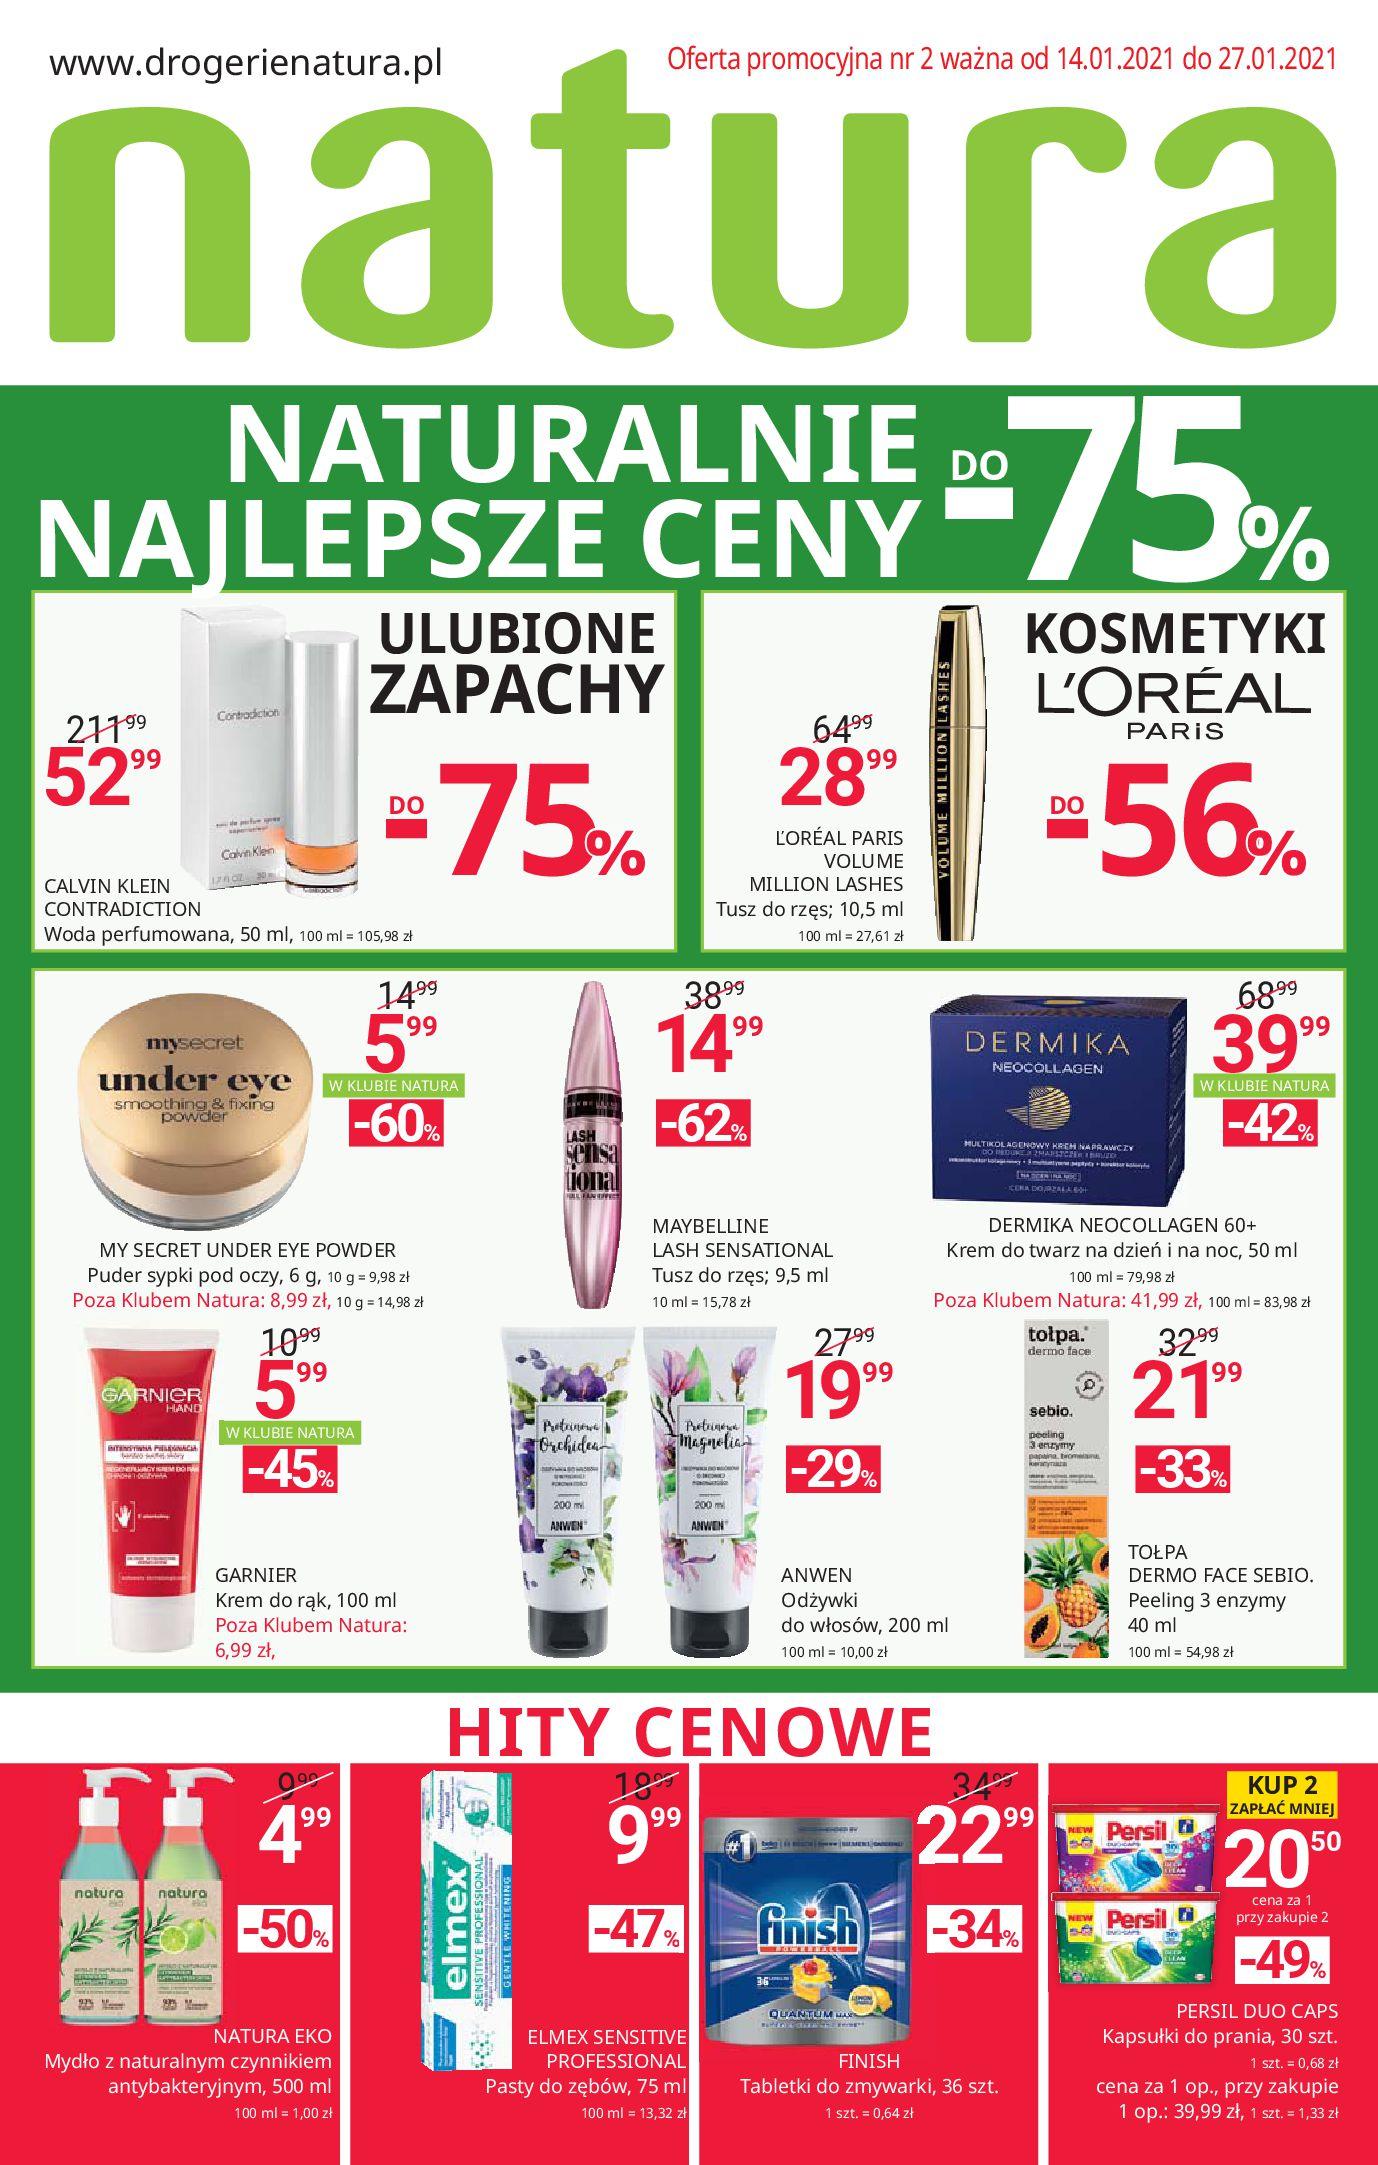 Drogerie Natura:  Gazetka promocyjna od 14.01 13.01.2021